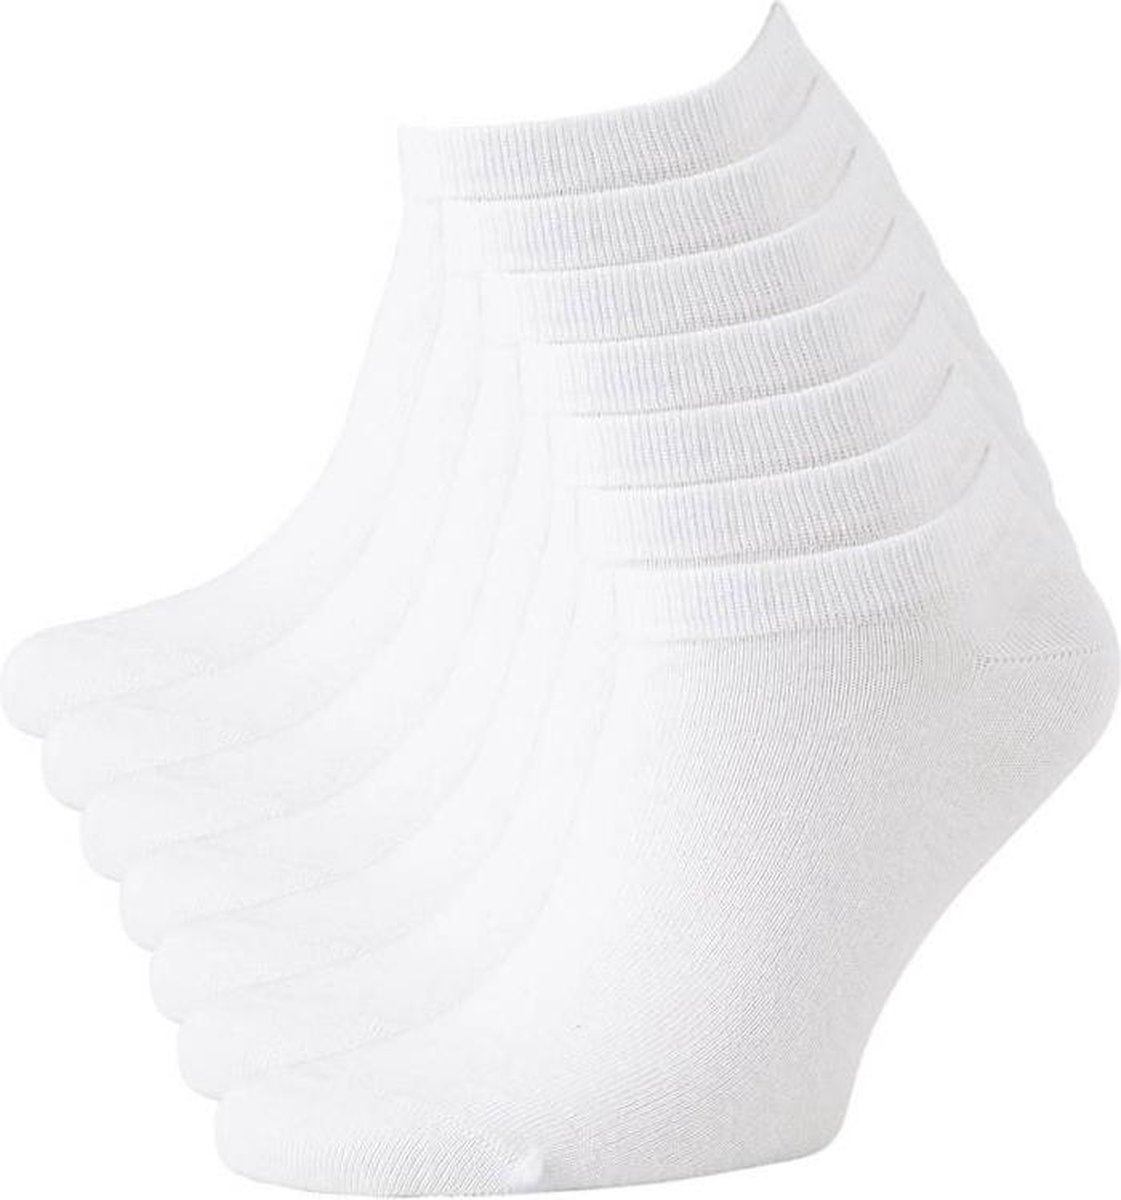 Sneaker Sokken - Enkel Sokjes - Wit - Maat 39/42 - 6 Pack